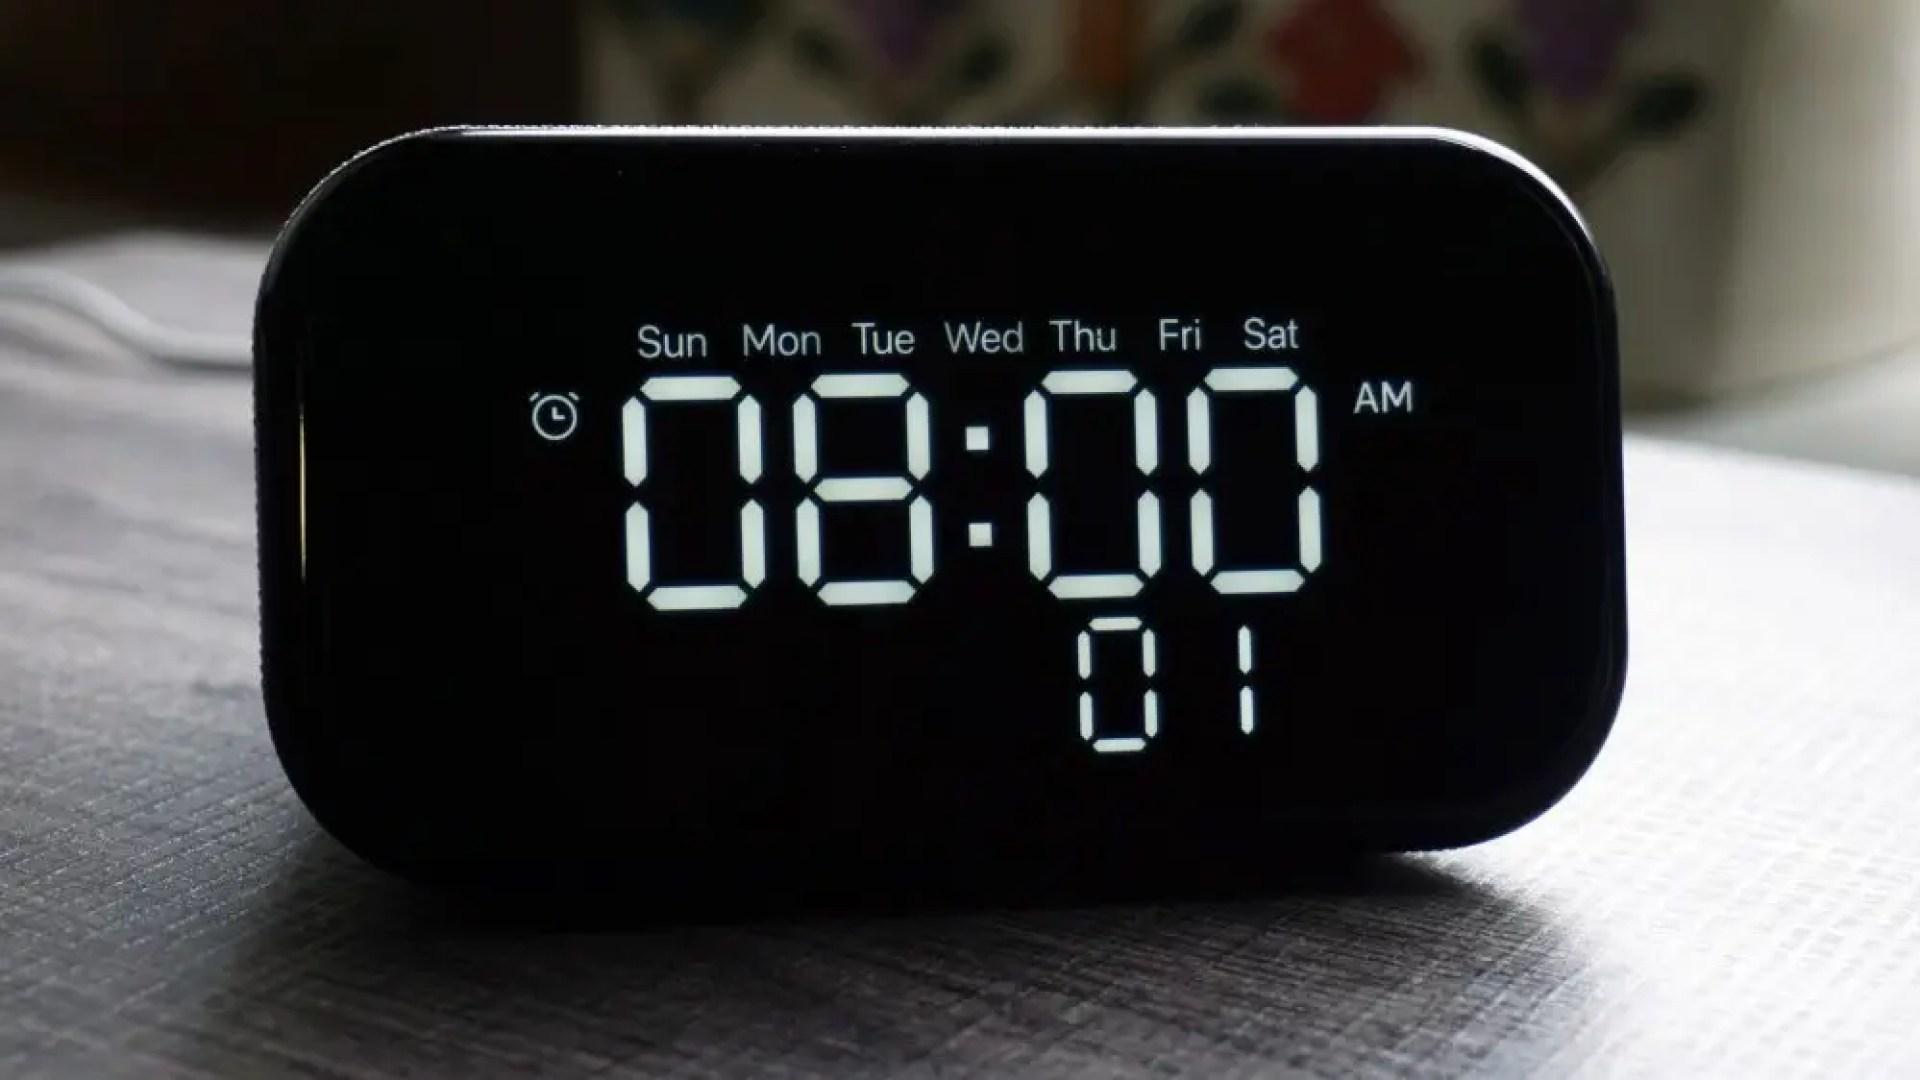 Lenovo Smart Clock Essential alarm setting